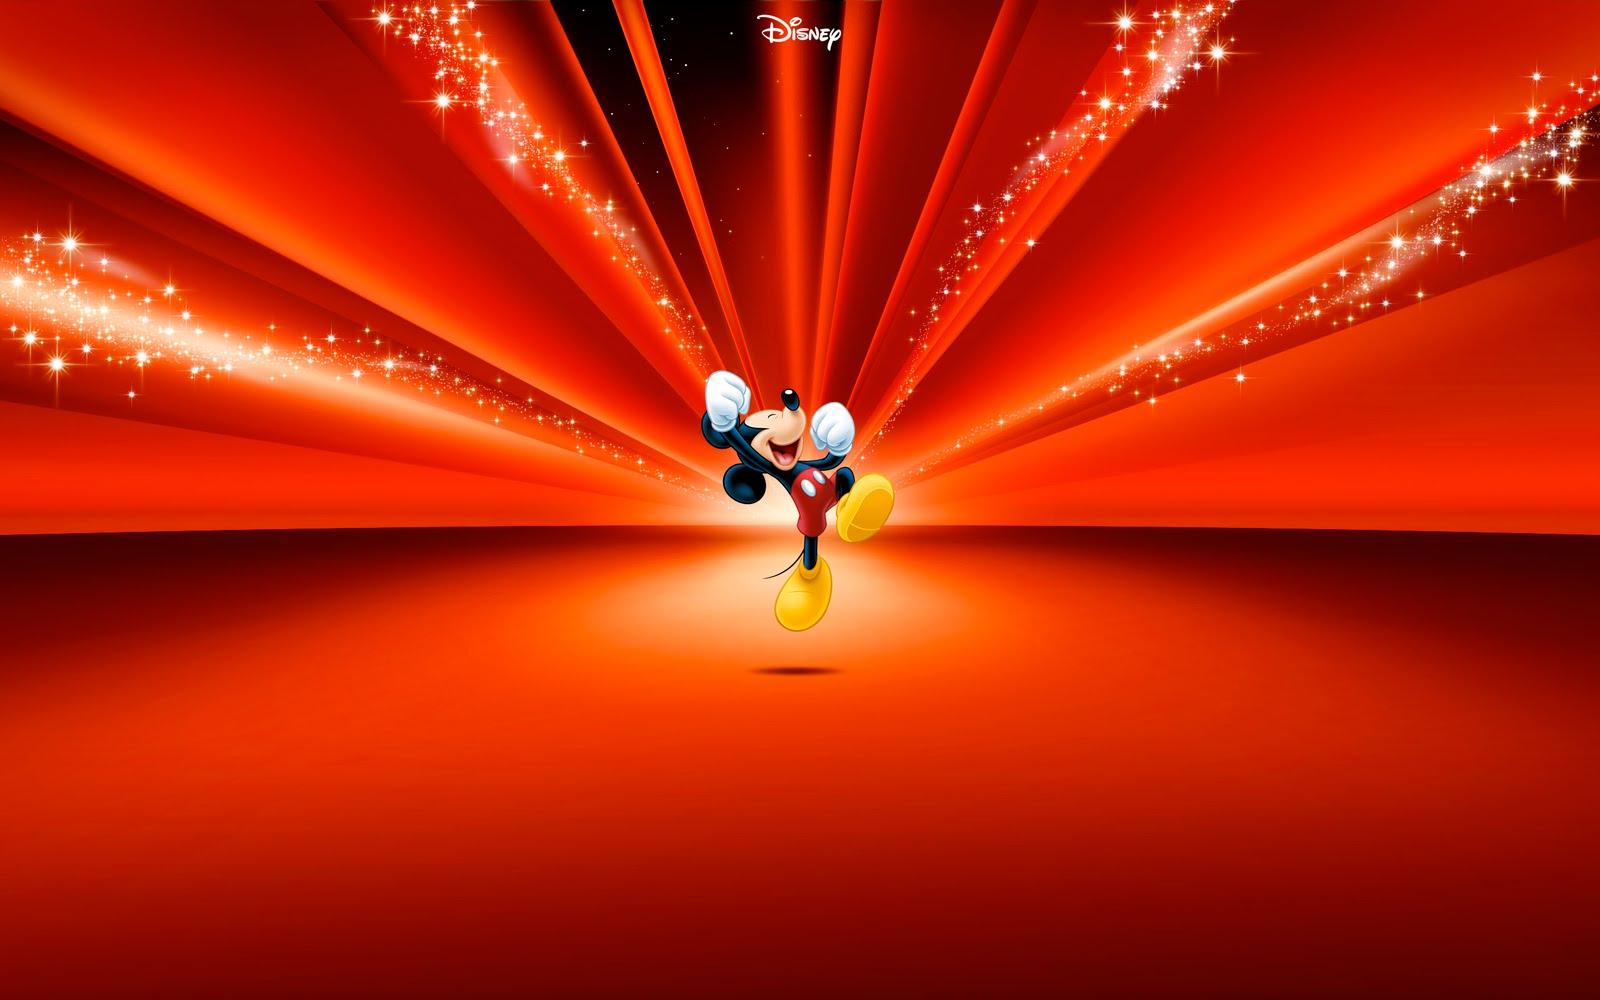 http://1.bp.blogspot.com/_2U3U6AwE-ZQ/TBZwb_vdZNI/AAAAAAAAARM/_V62RW-eBbs/s1600/Walt-Disney-006%28www.TheWallpapers.org%29.jpg